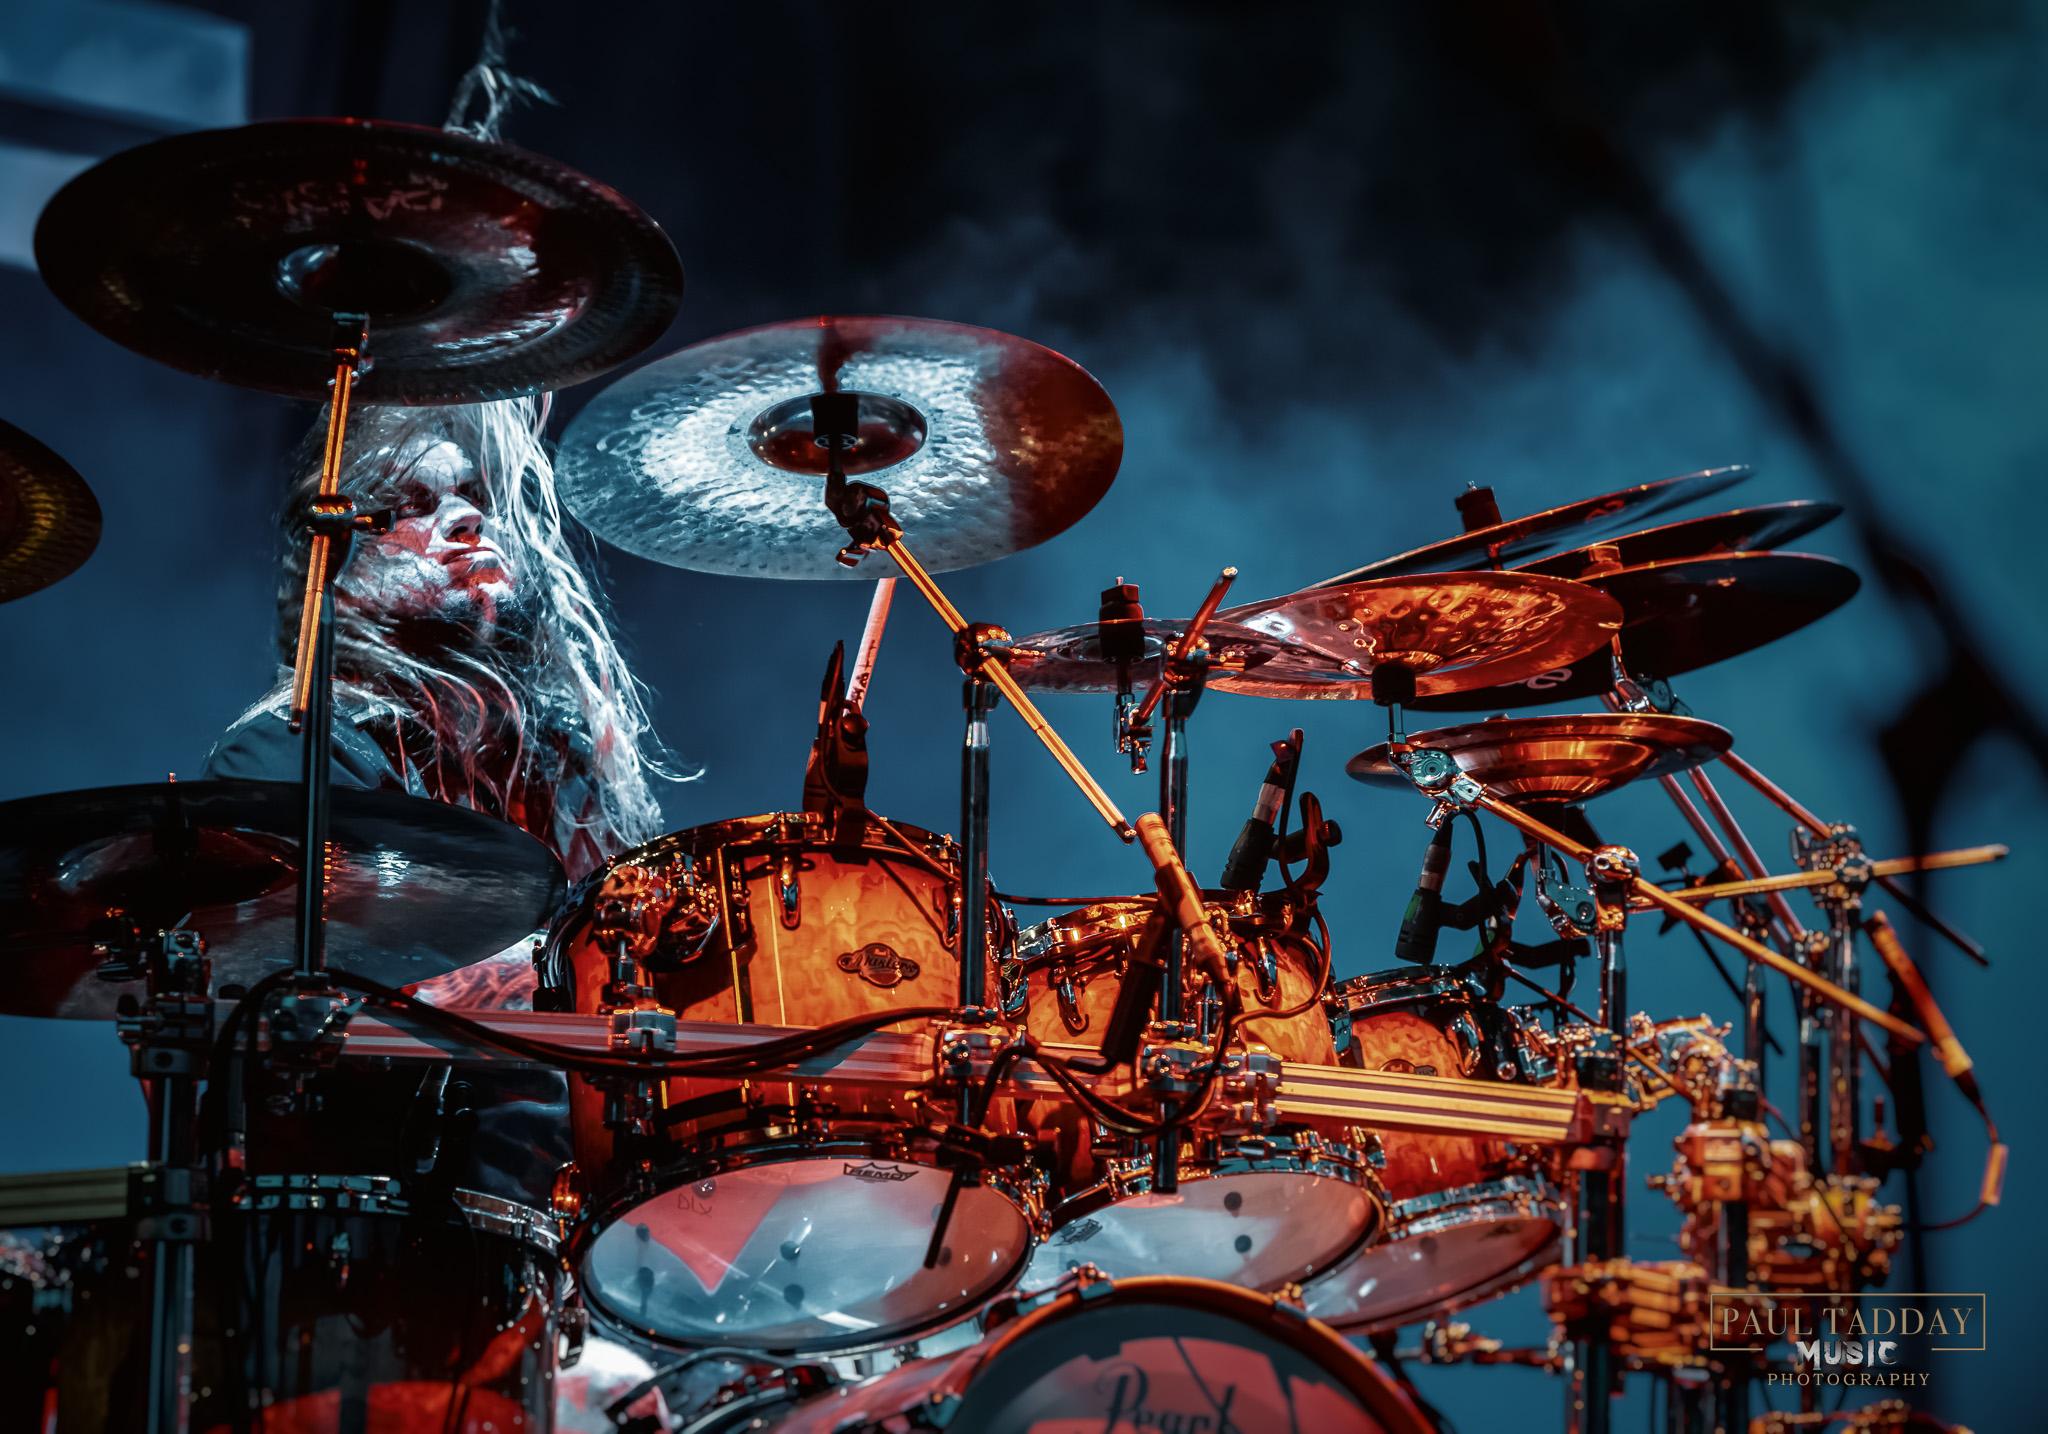 behemoth - brisbane - march 7 2019 - web - paul tadday photography - 11.jpg